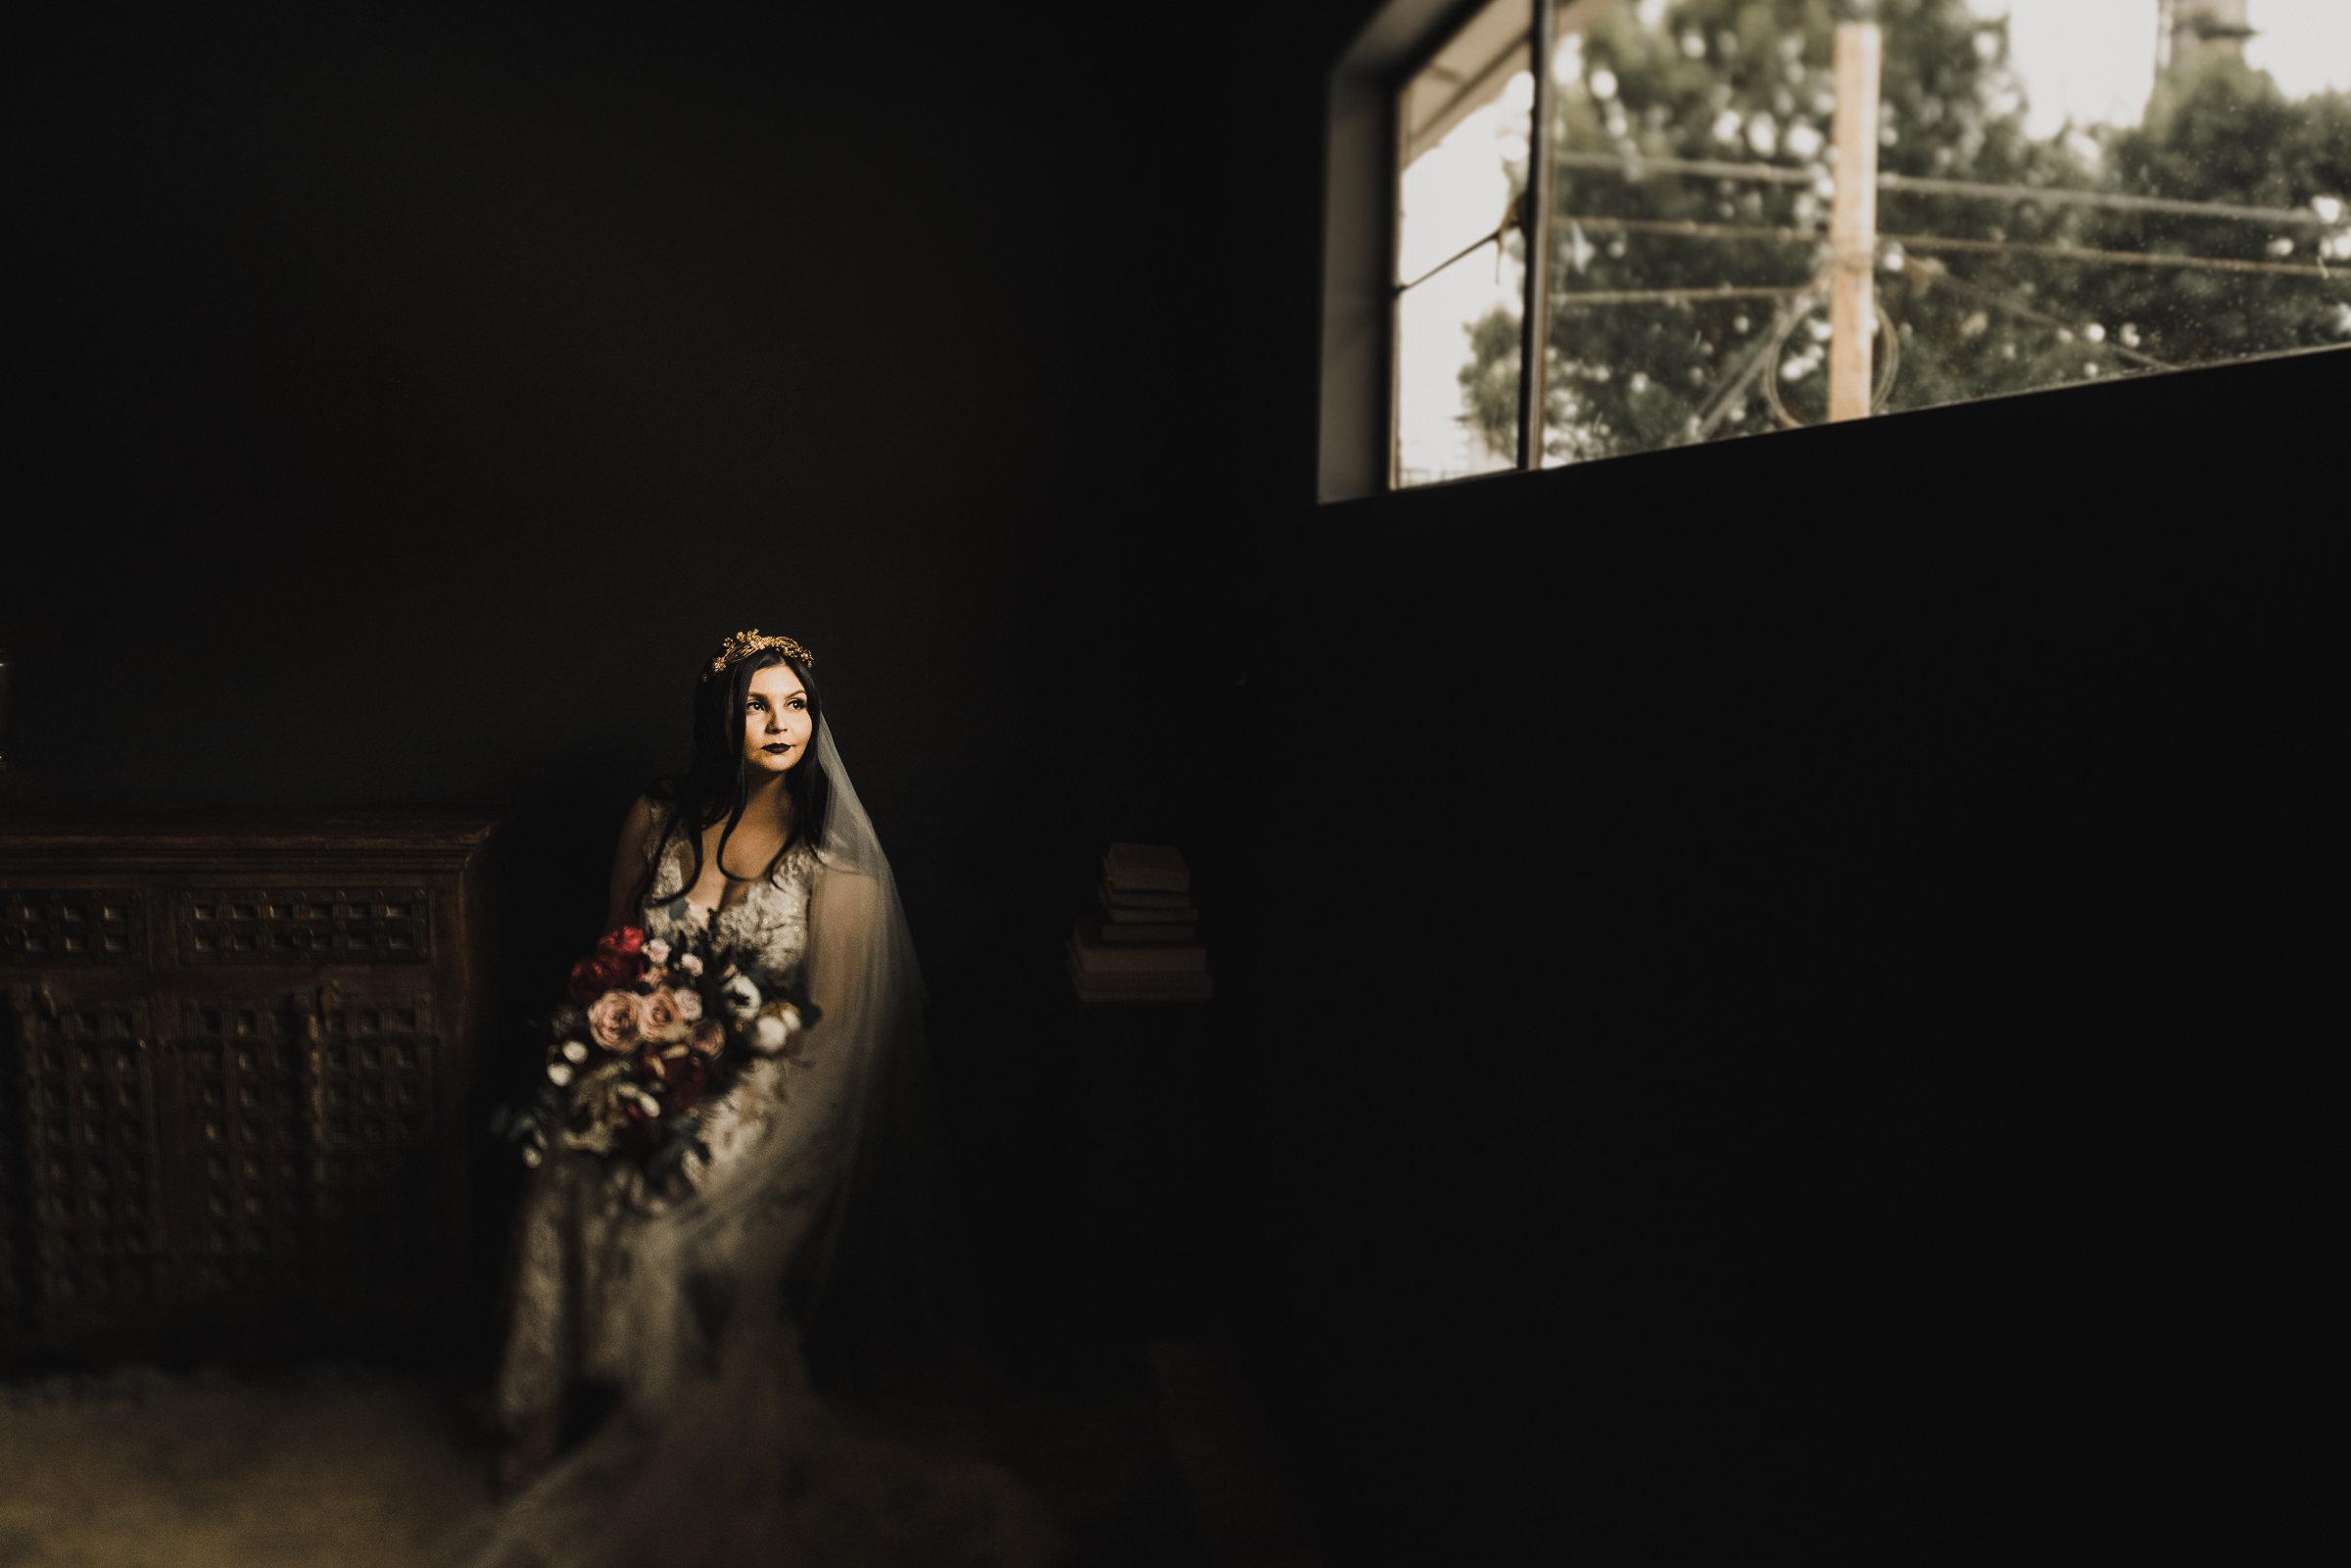 Isaiah+TaylorPhotography-Jordan+CassieWedding,SmokyHollowStudios,ElSegundo10-30-16-0002.jpg